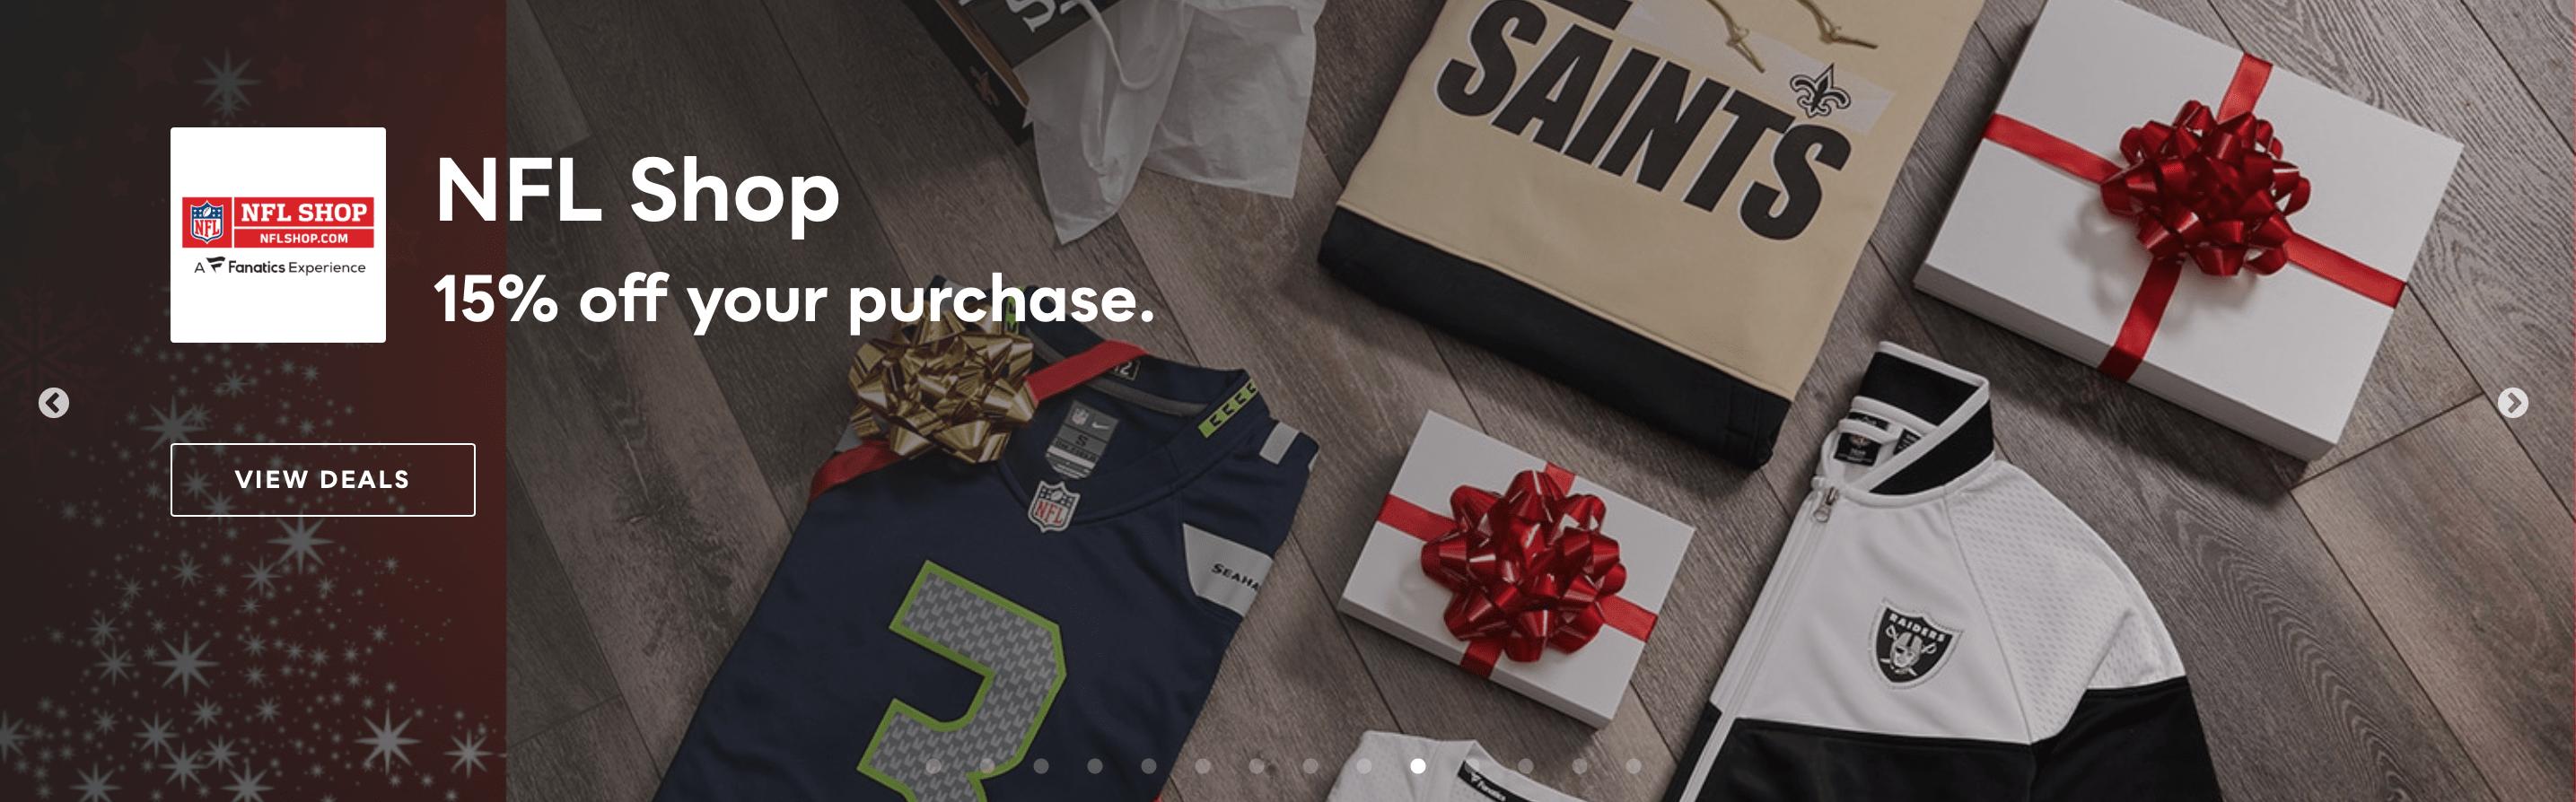 NFL Shop Savvy Perks